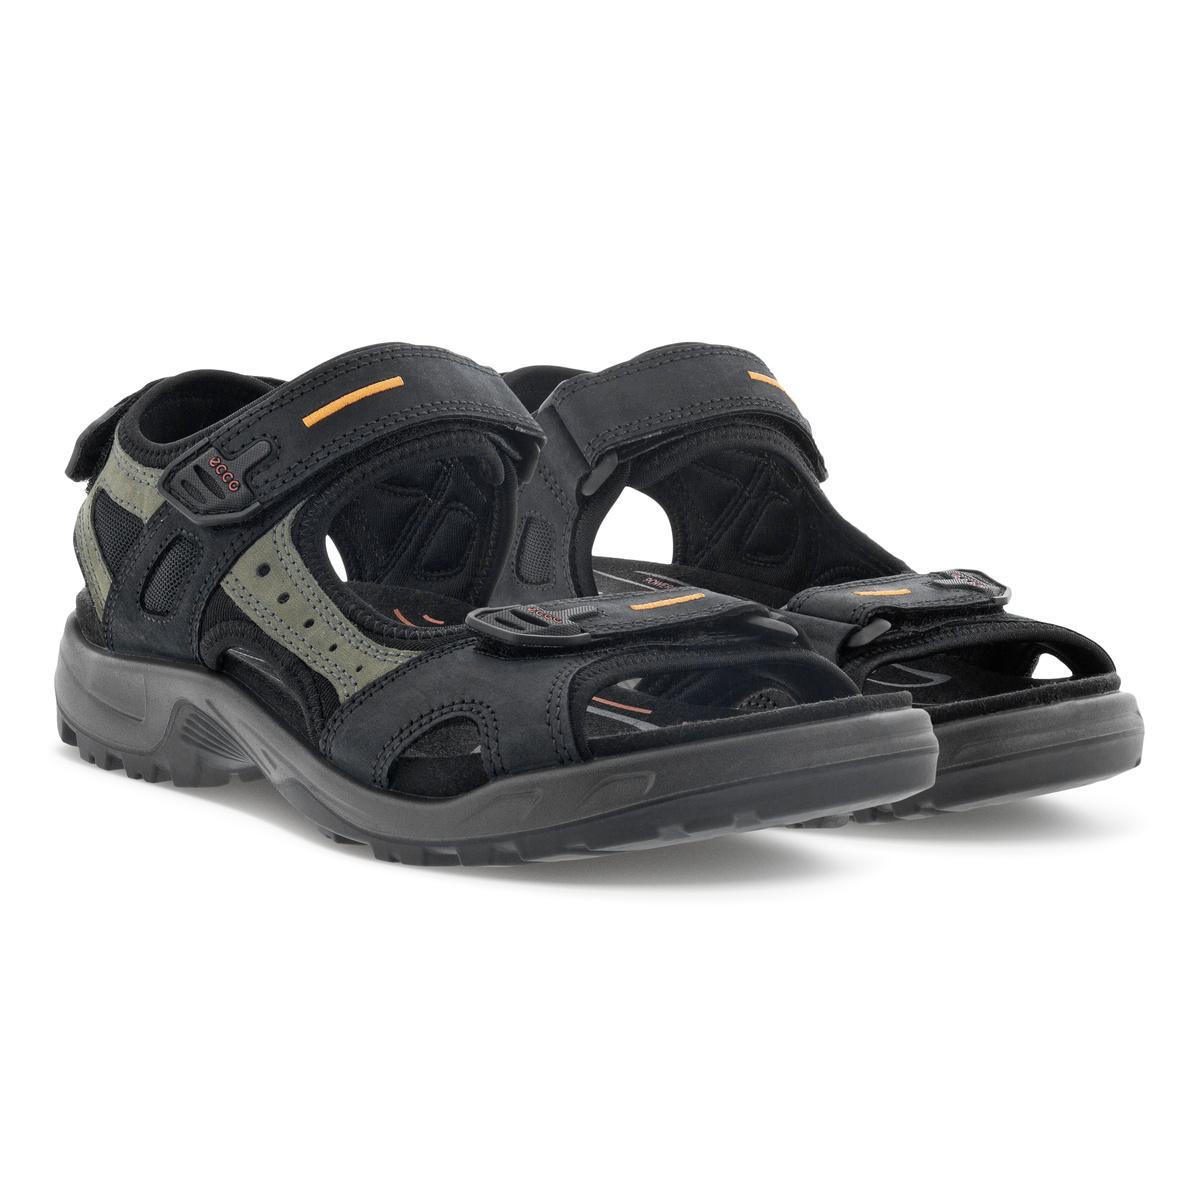 Sandals OFFROAD ECCO Shoes NZ